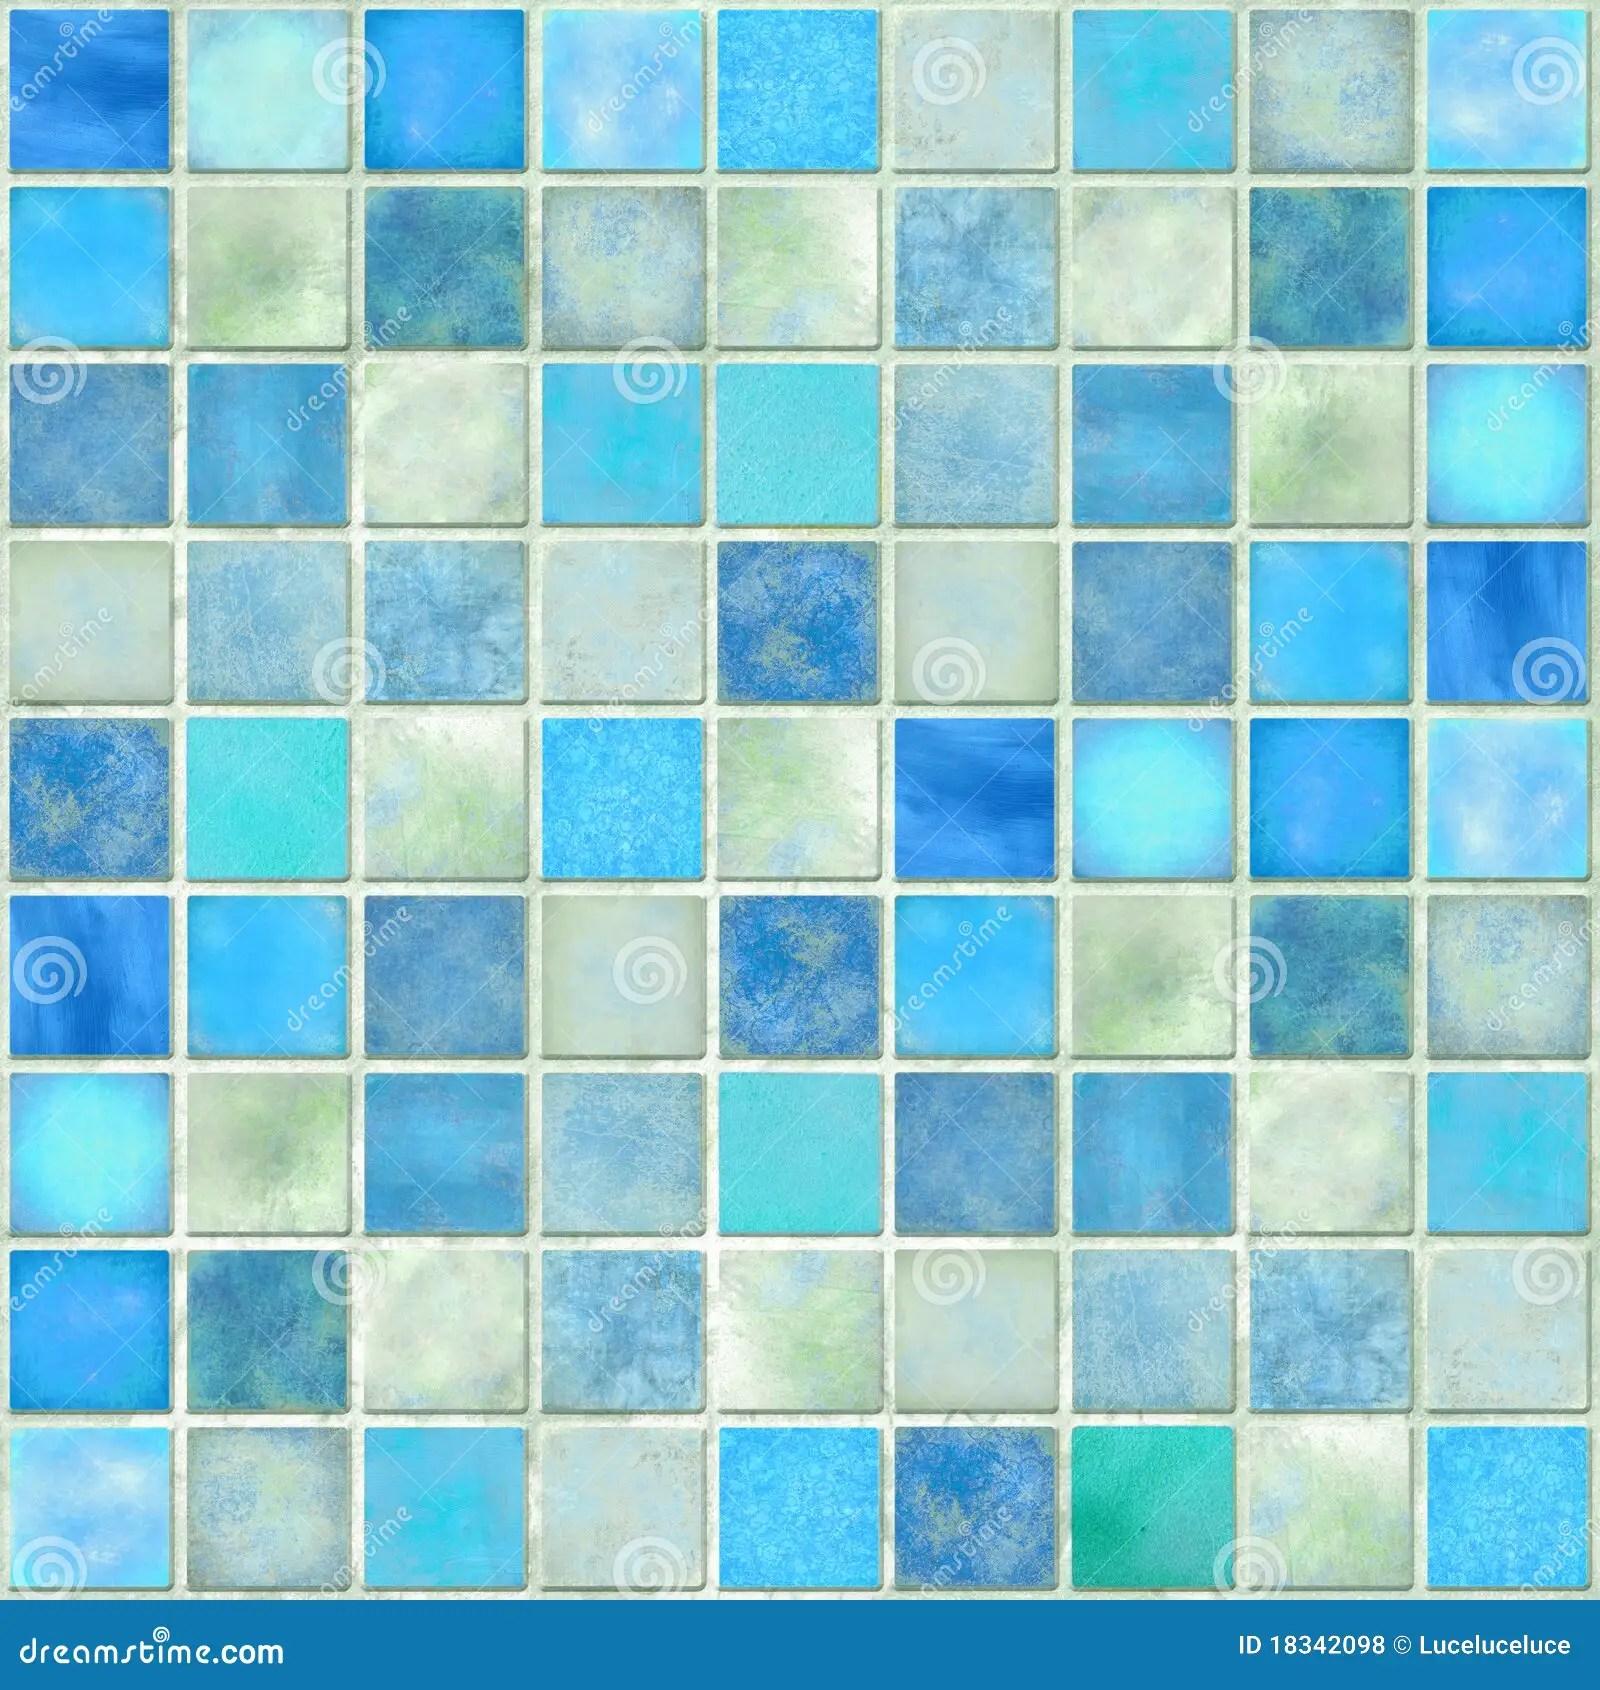 Islamic Wallpaper Hd 3d Blue Tile Mosaic Royalty Free Stock Photos Image 18342098